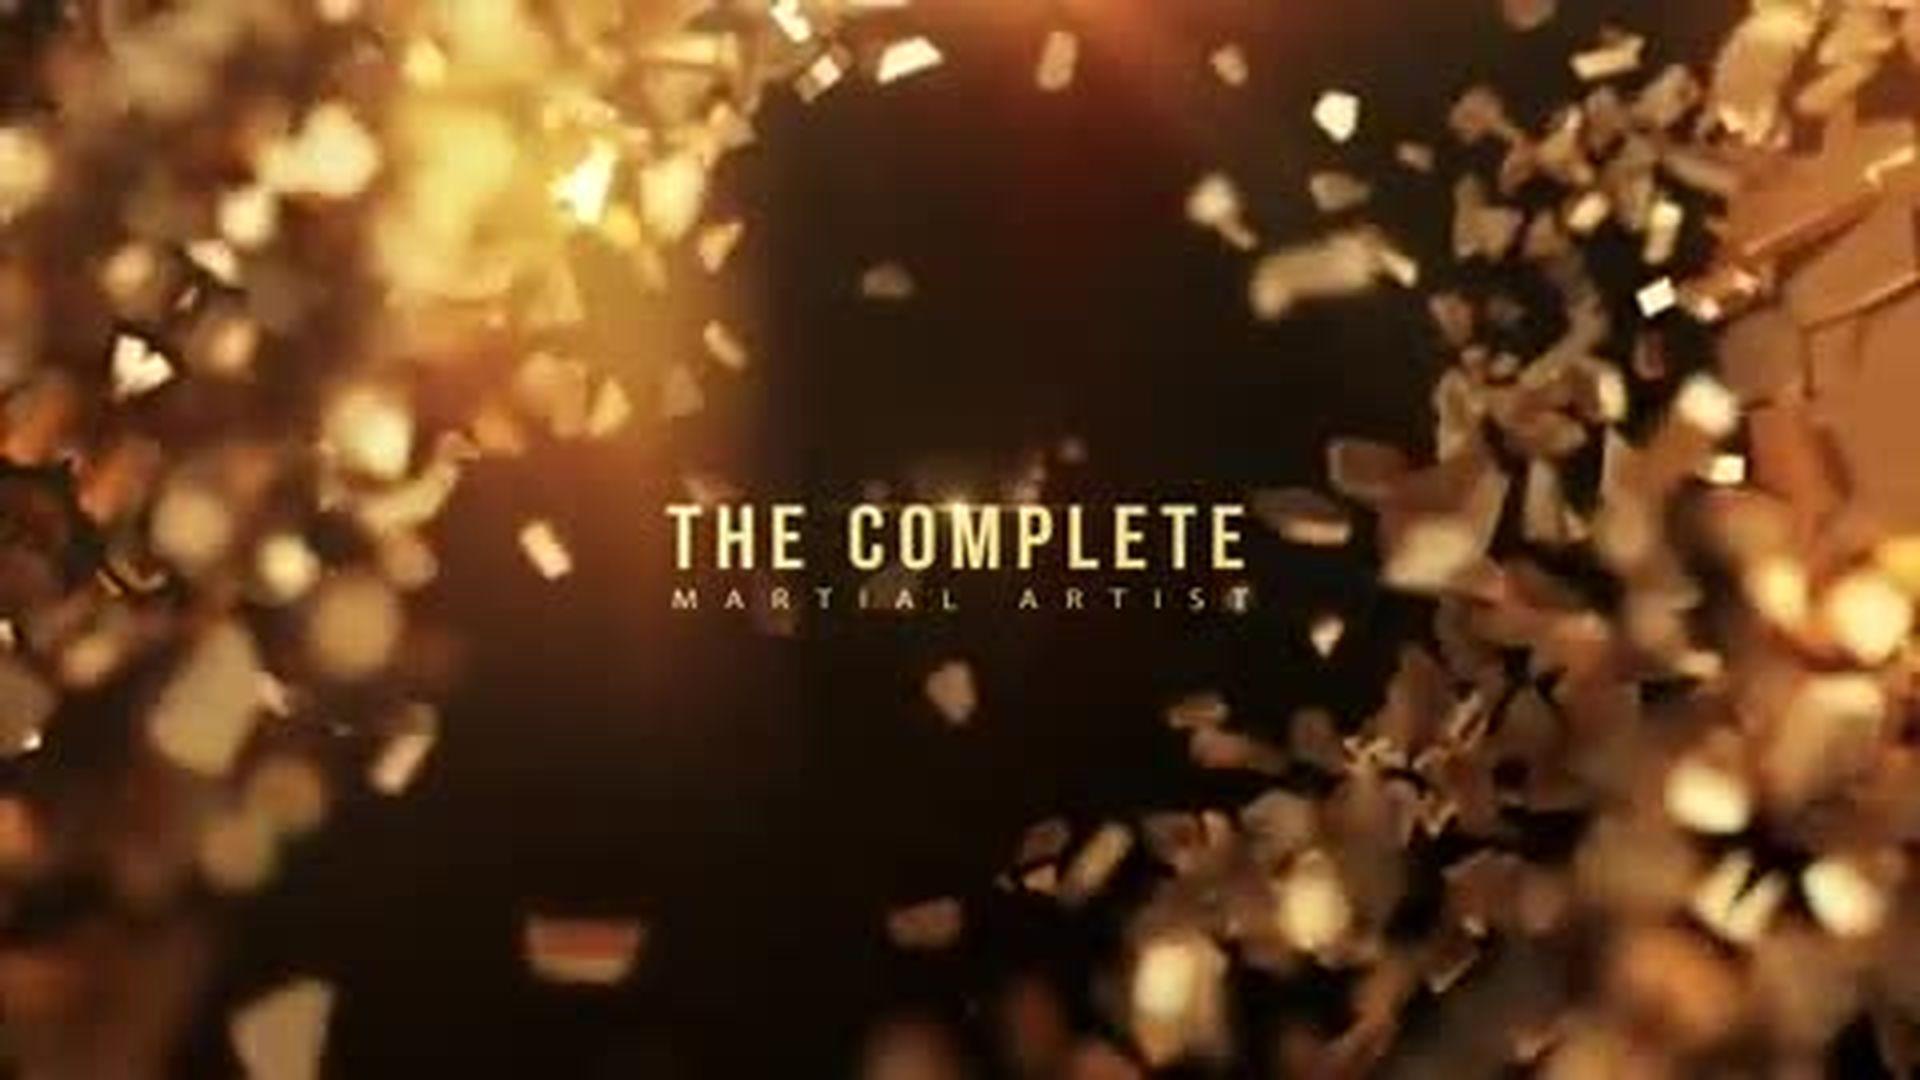 UASC - The Complete Martial Artist